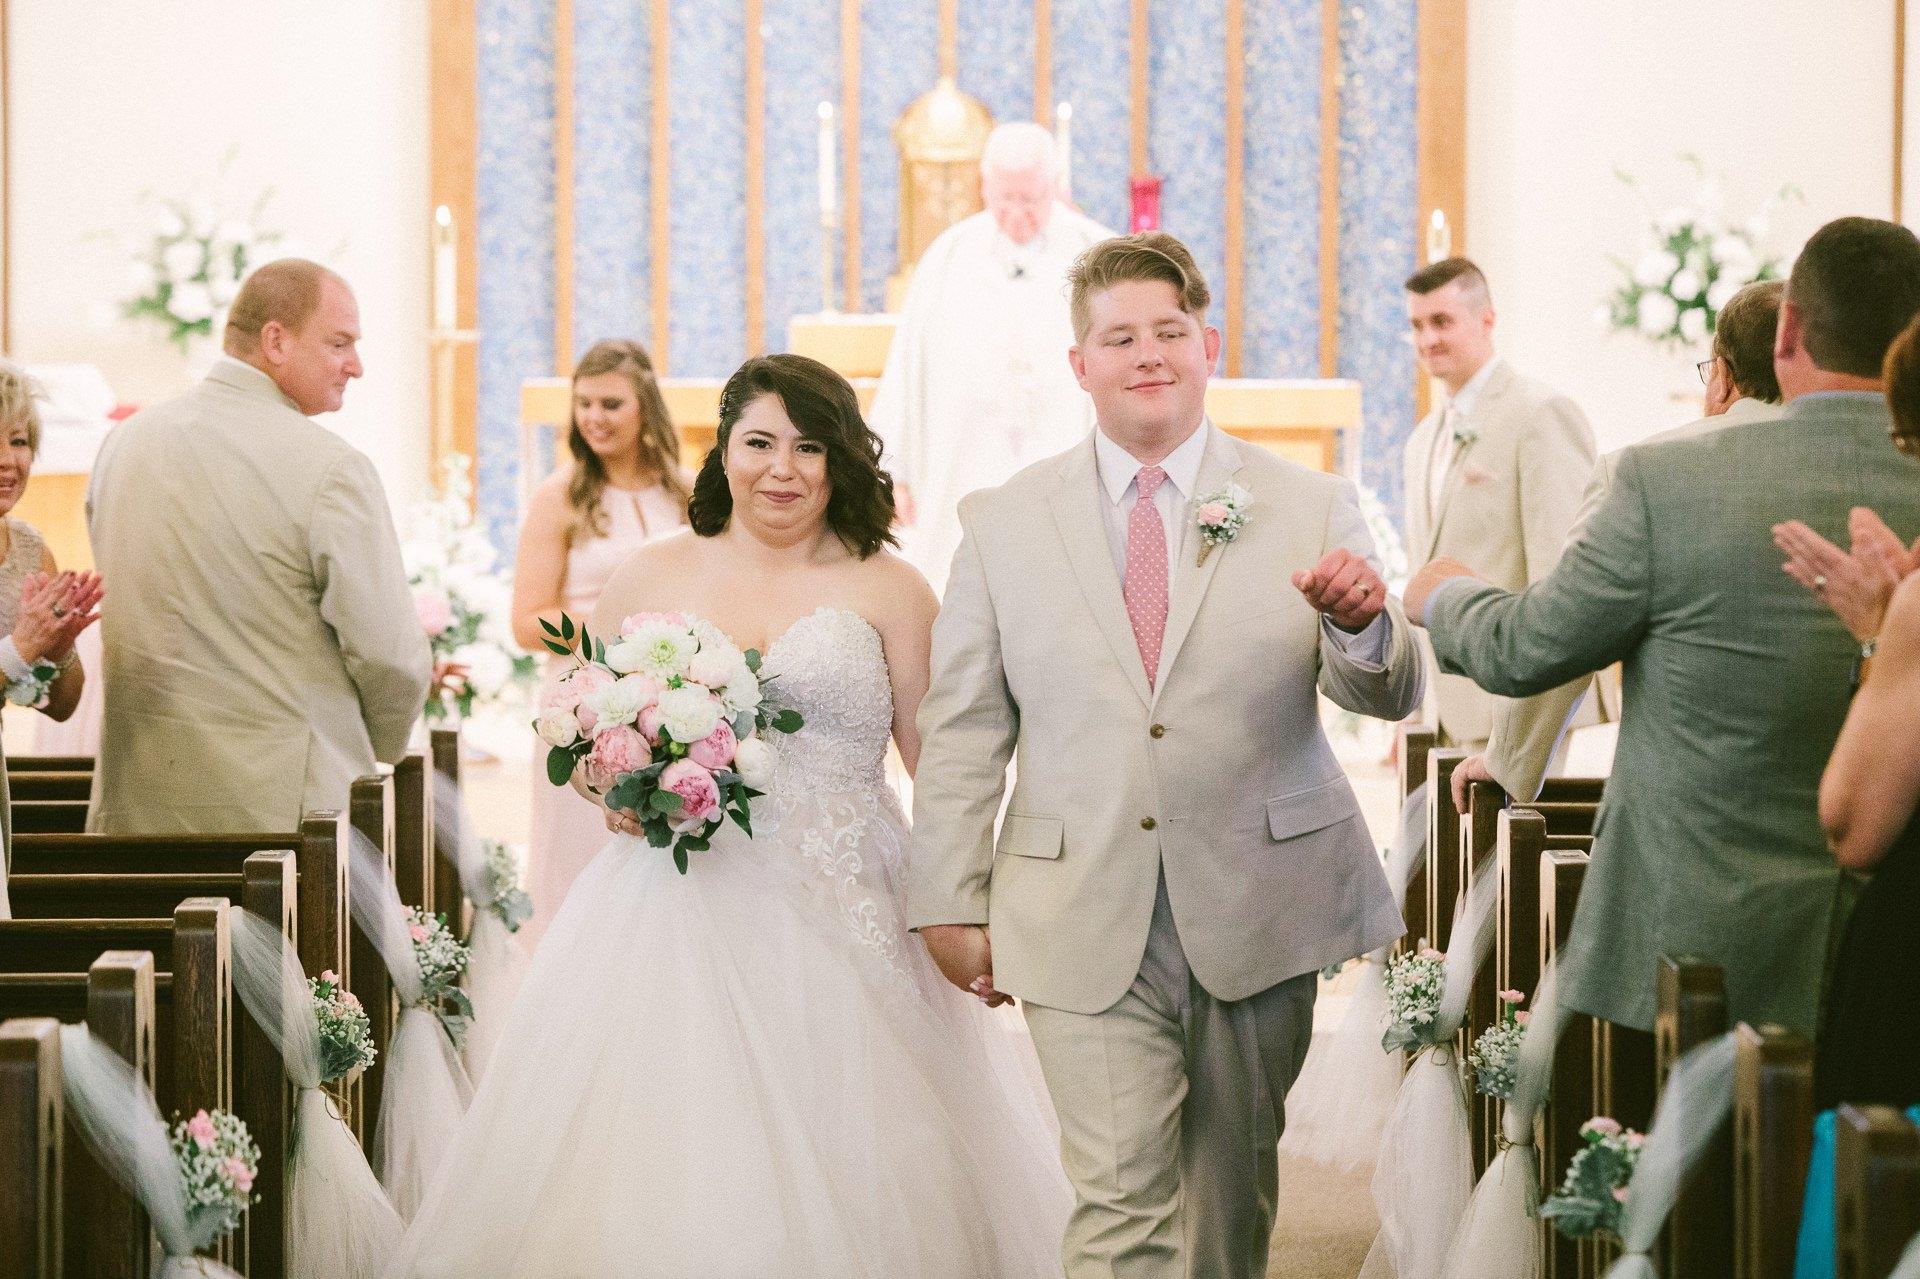 Mon Ami Winery Wedding in Port Clinton 1 22.jpg